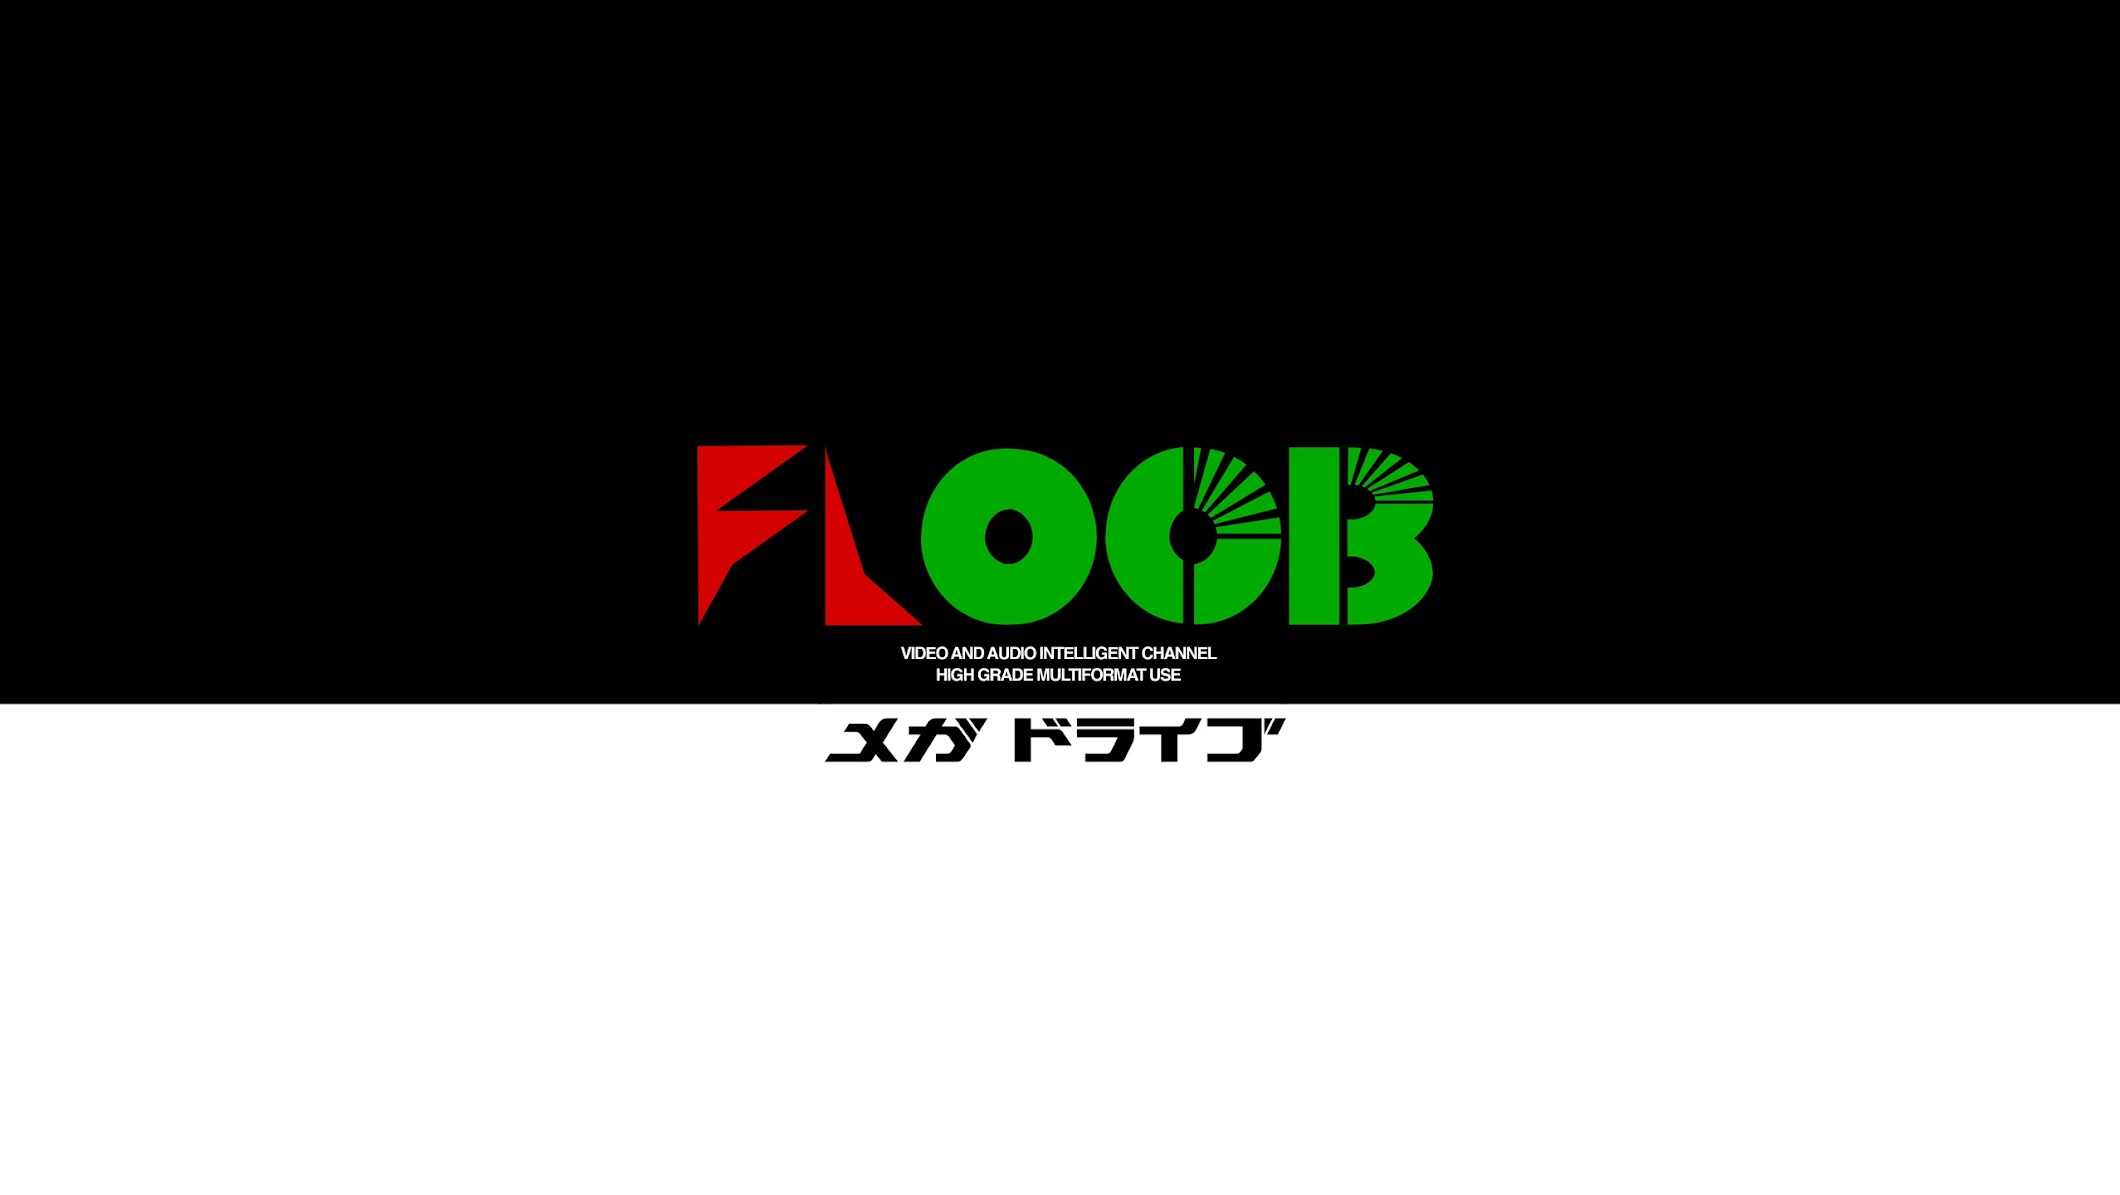 Floob - YouTube